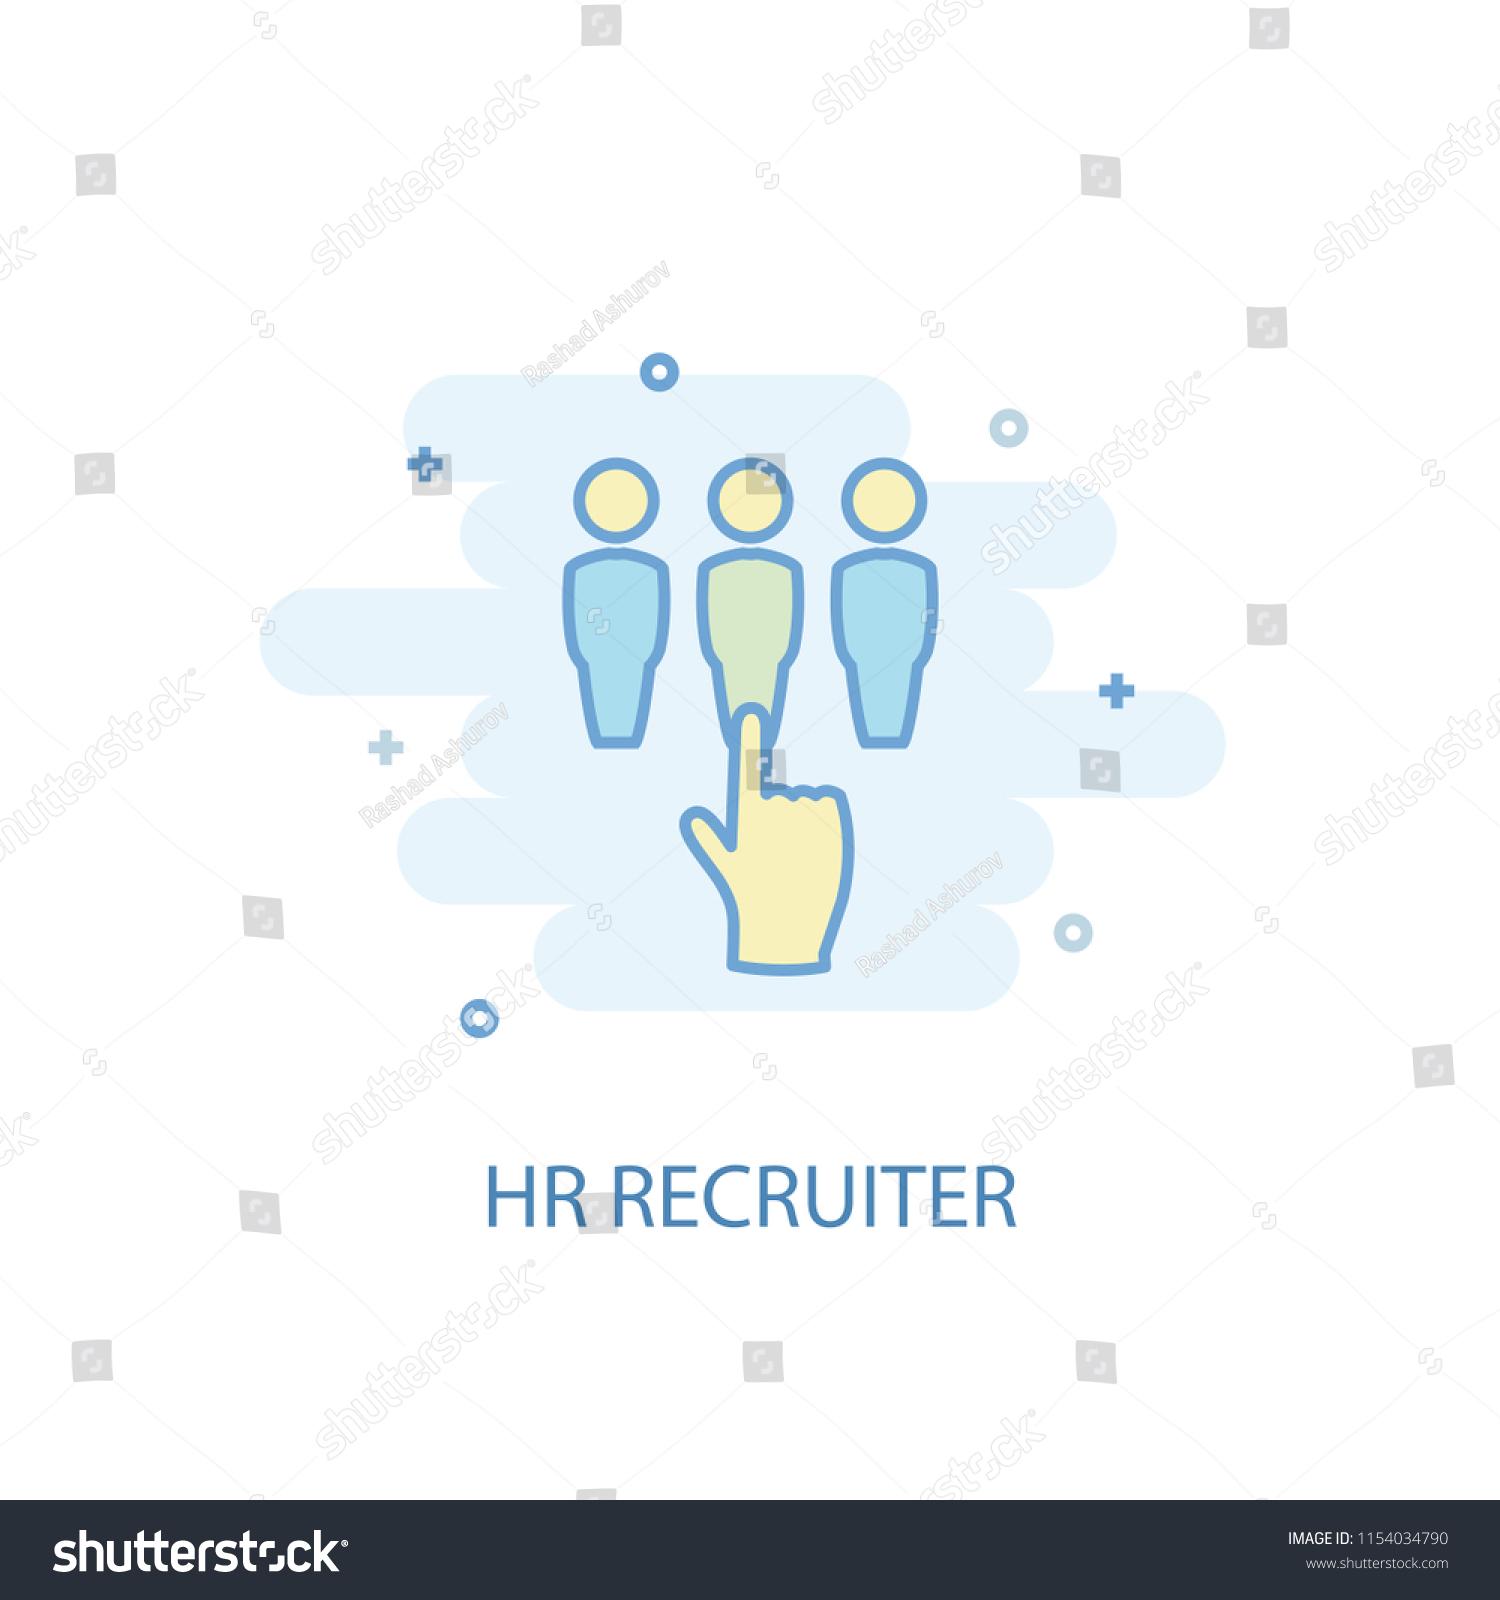 hr recruiter concept trendy icon  simple line, colored illustration  hr  recruiter concept symbol